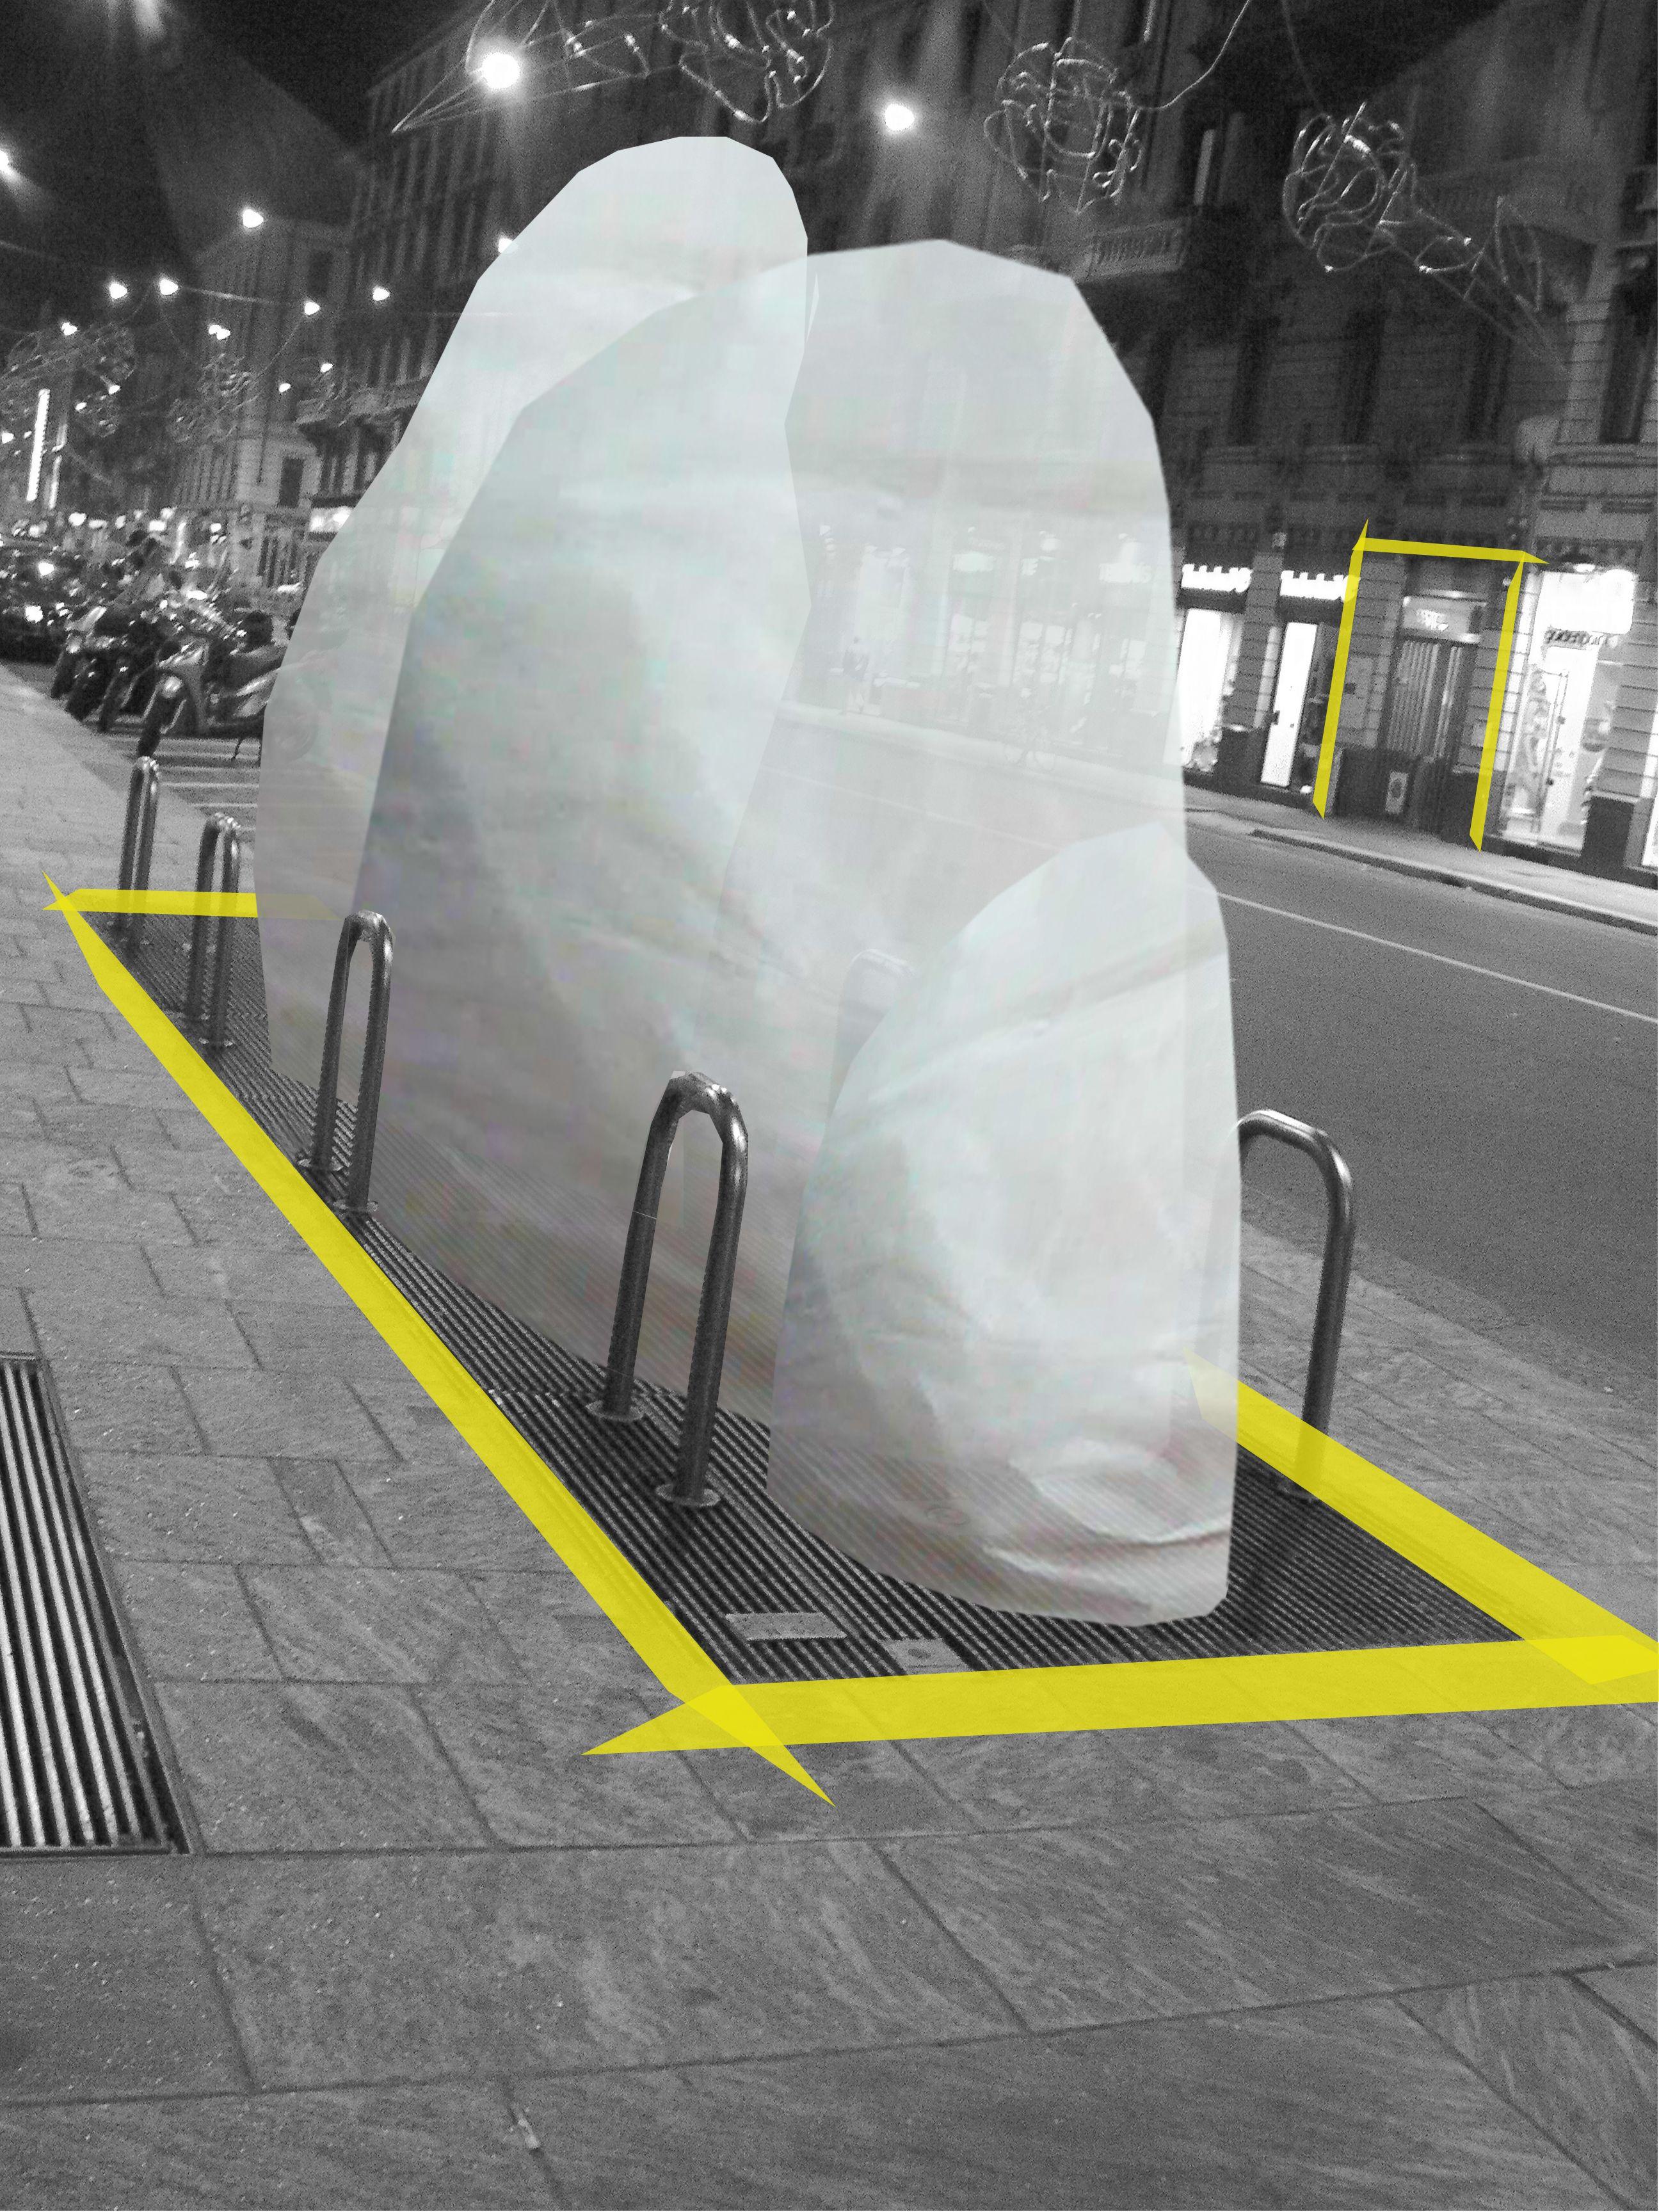 Contaminazioni urbane, allestimento temporaneo - Corso Buenosaires - Milano